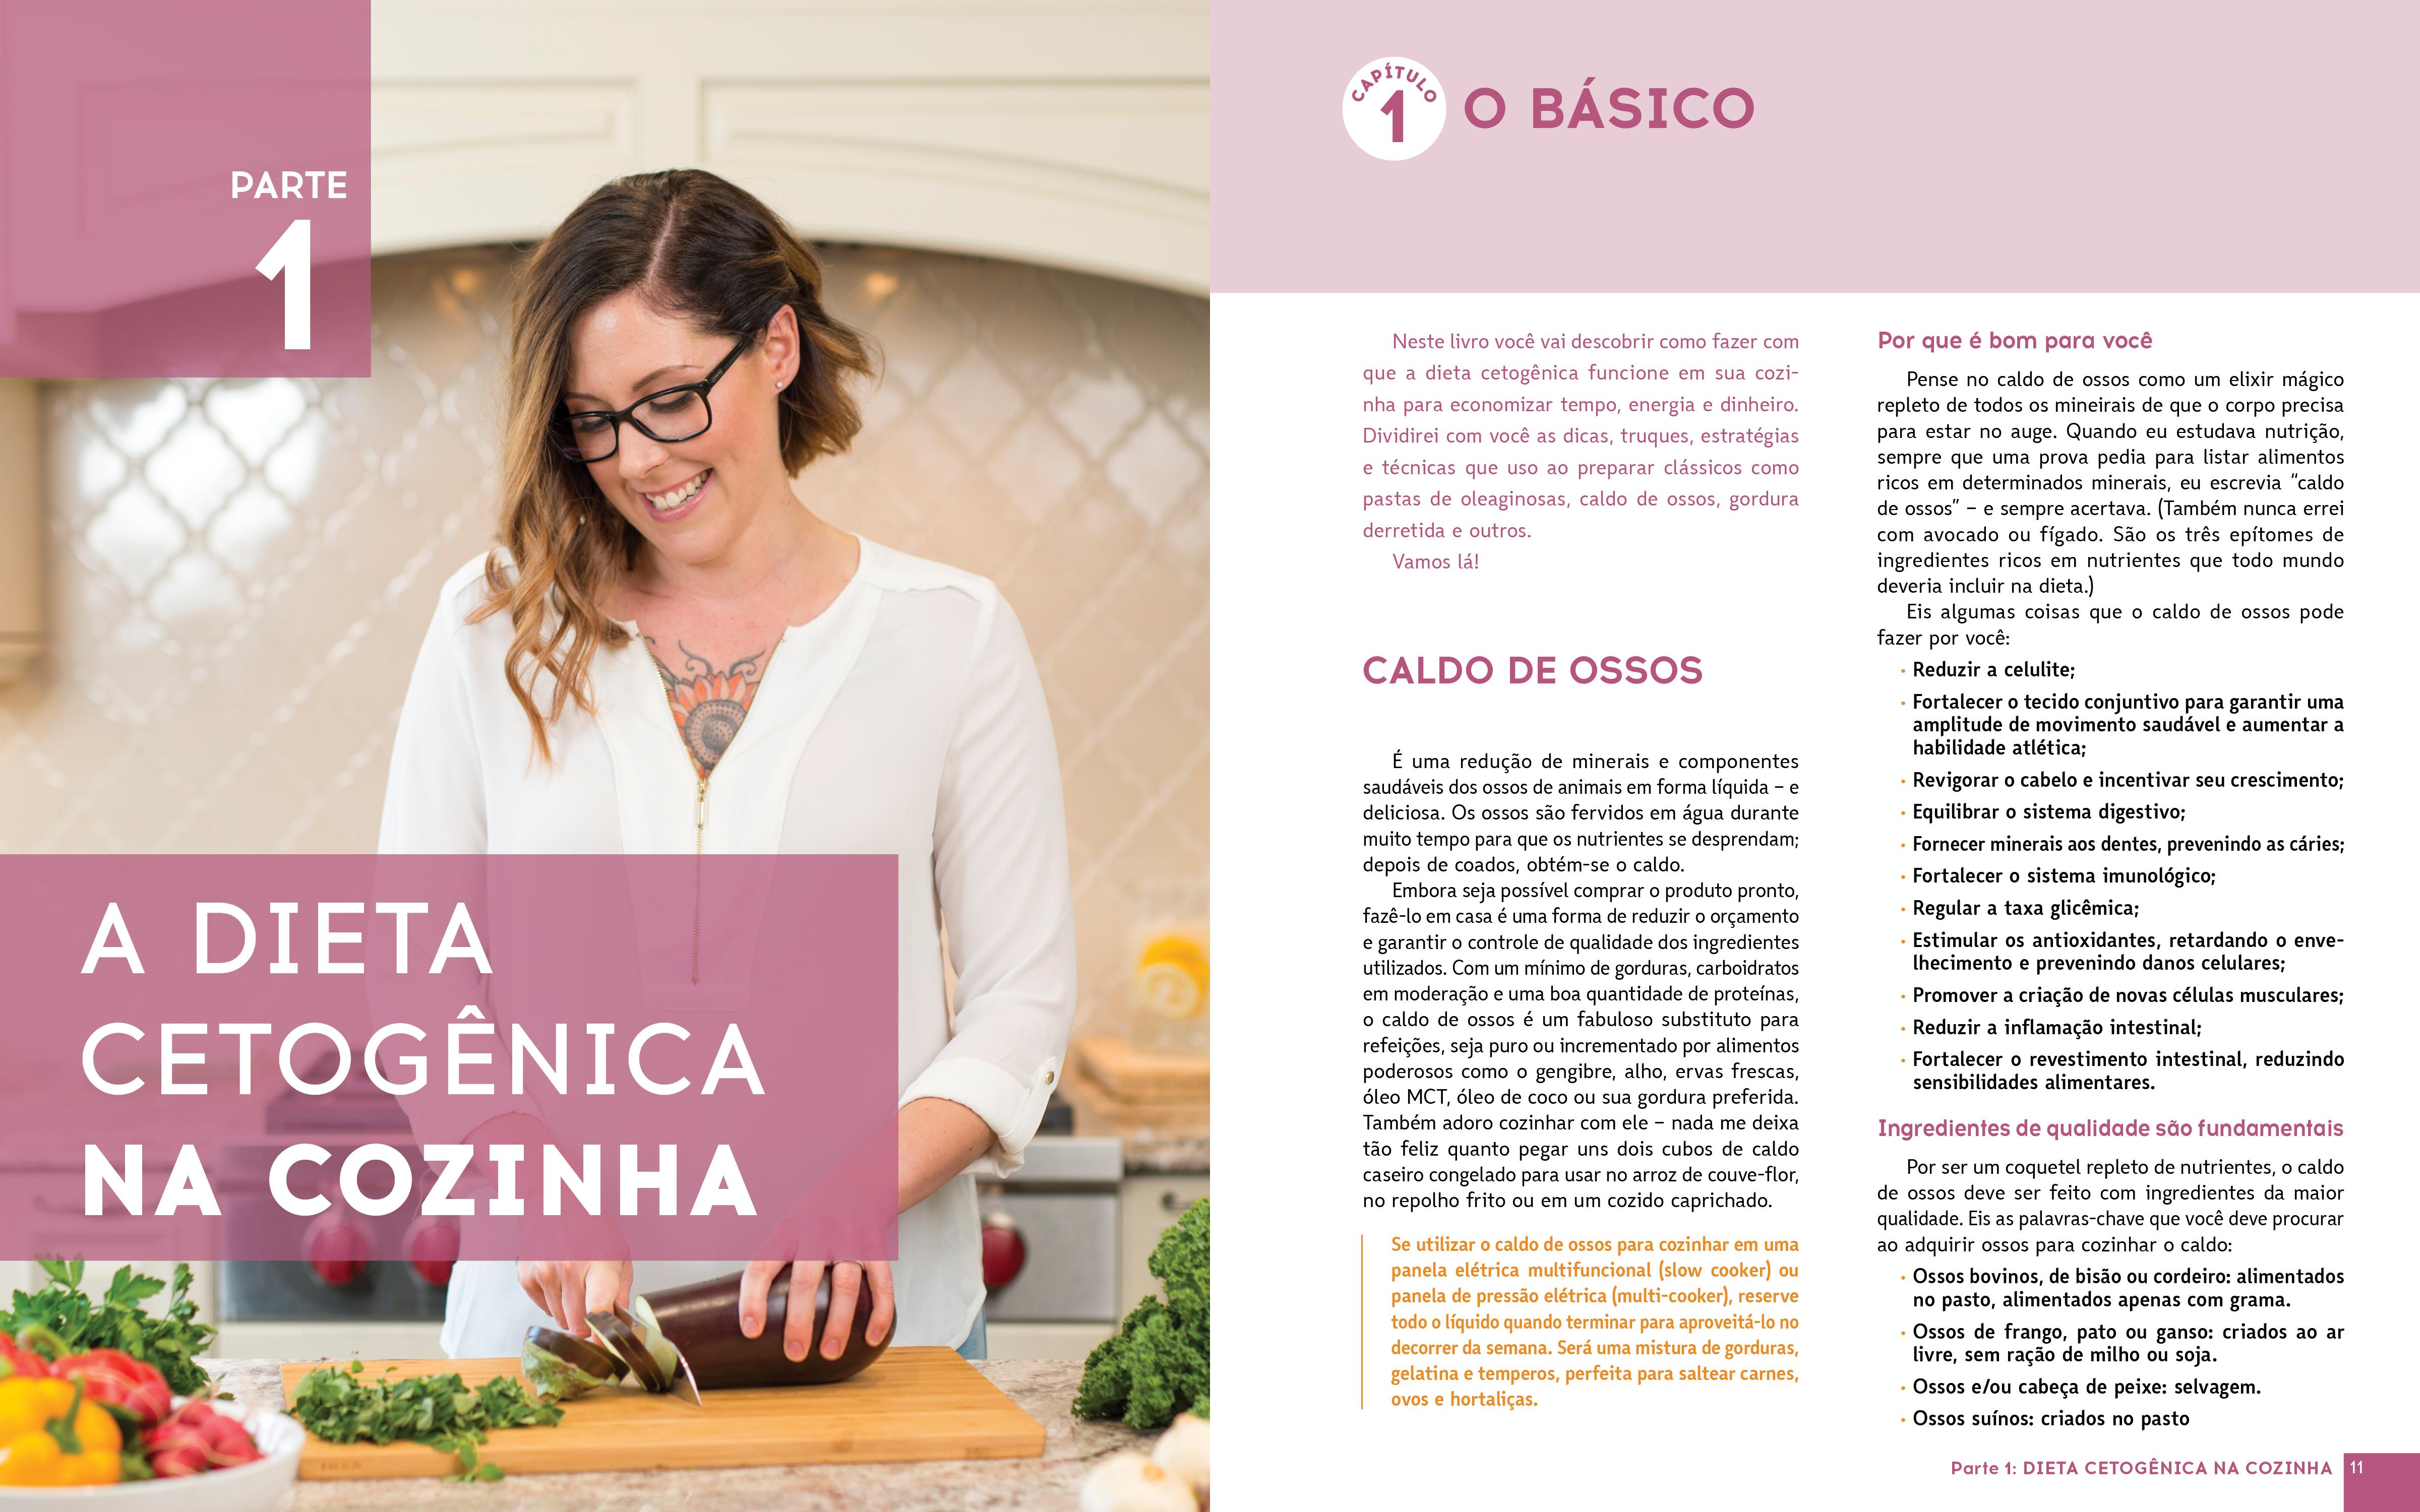 Low Carb - A Dieta Cetogênica - 125 receitas - Leanne Vogel